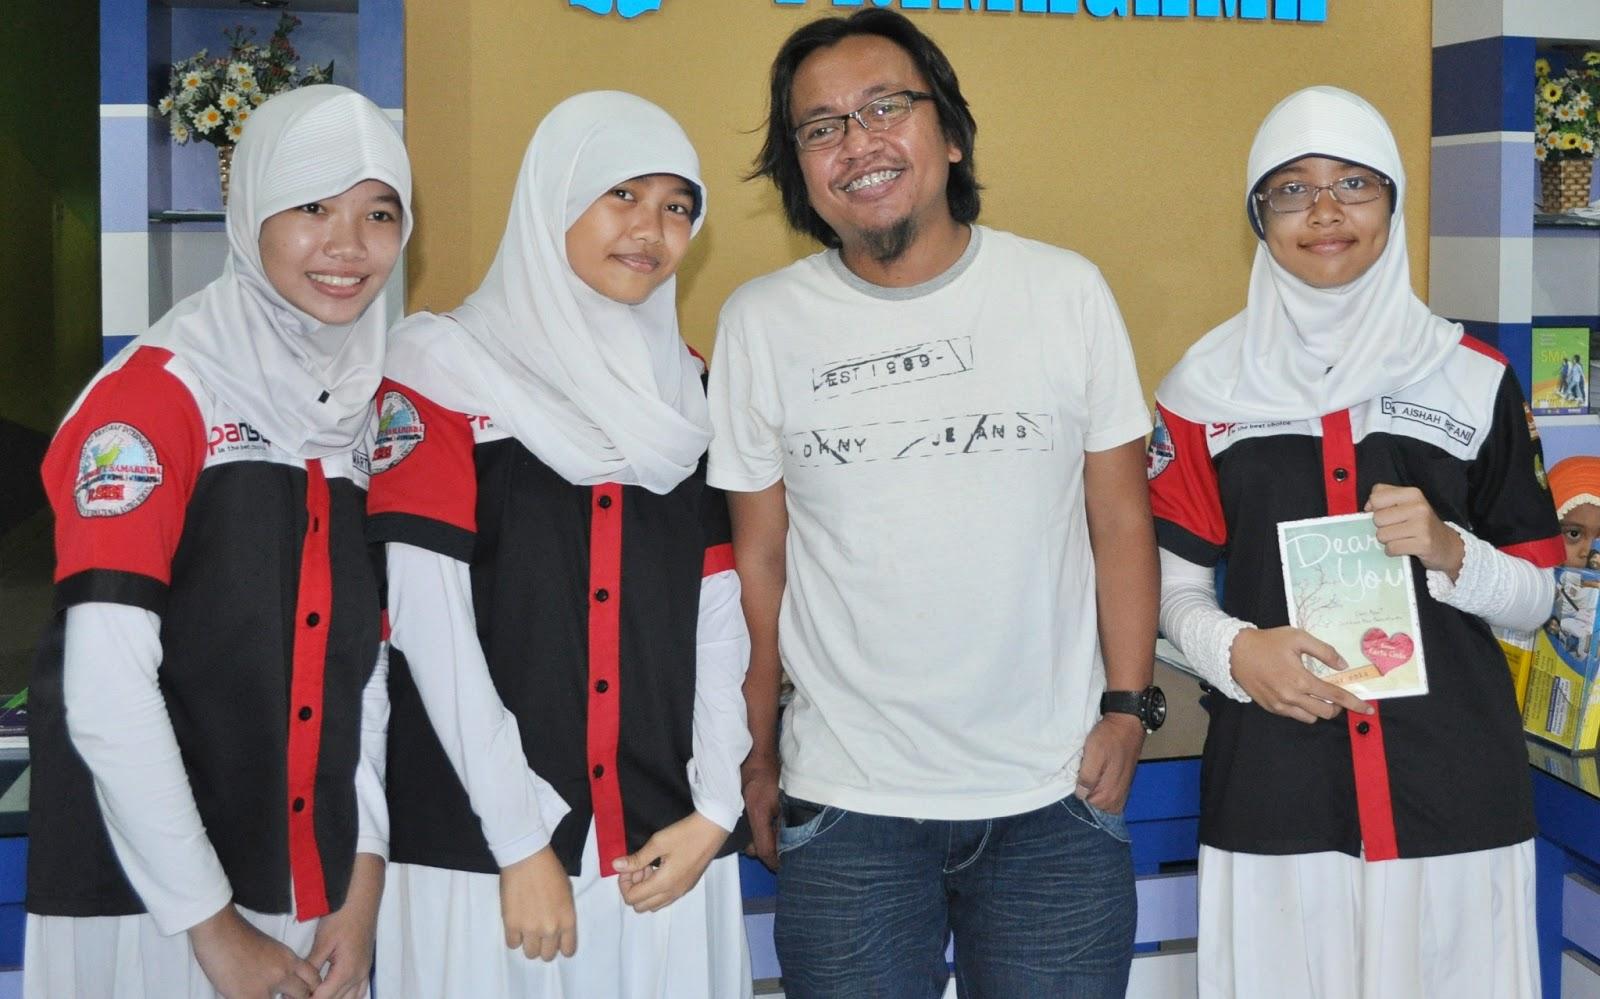 Foto bareng: (dari kiri) Hera, Azizah, Moammar Emka, dinda